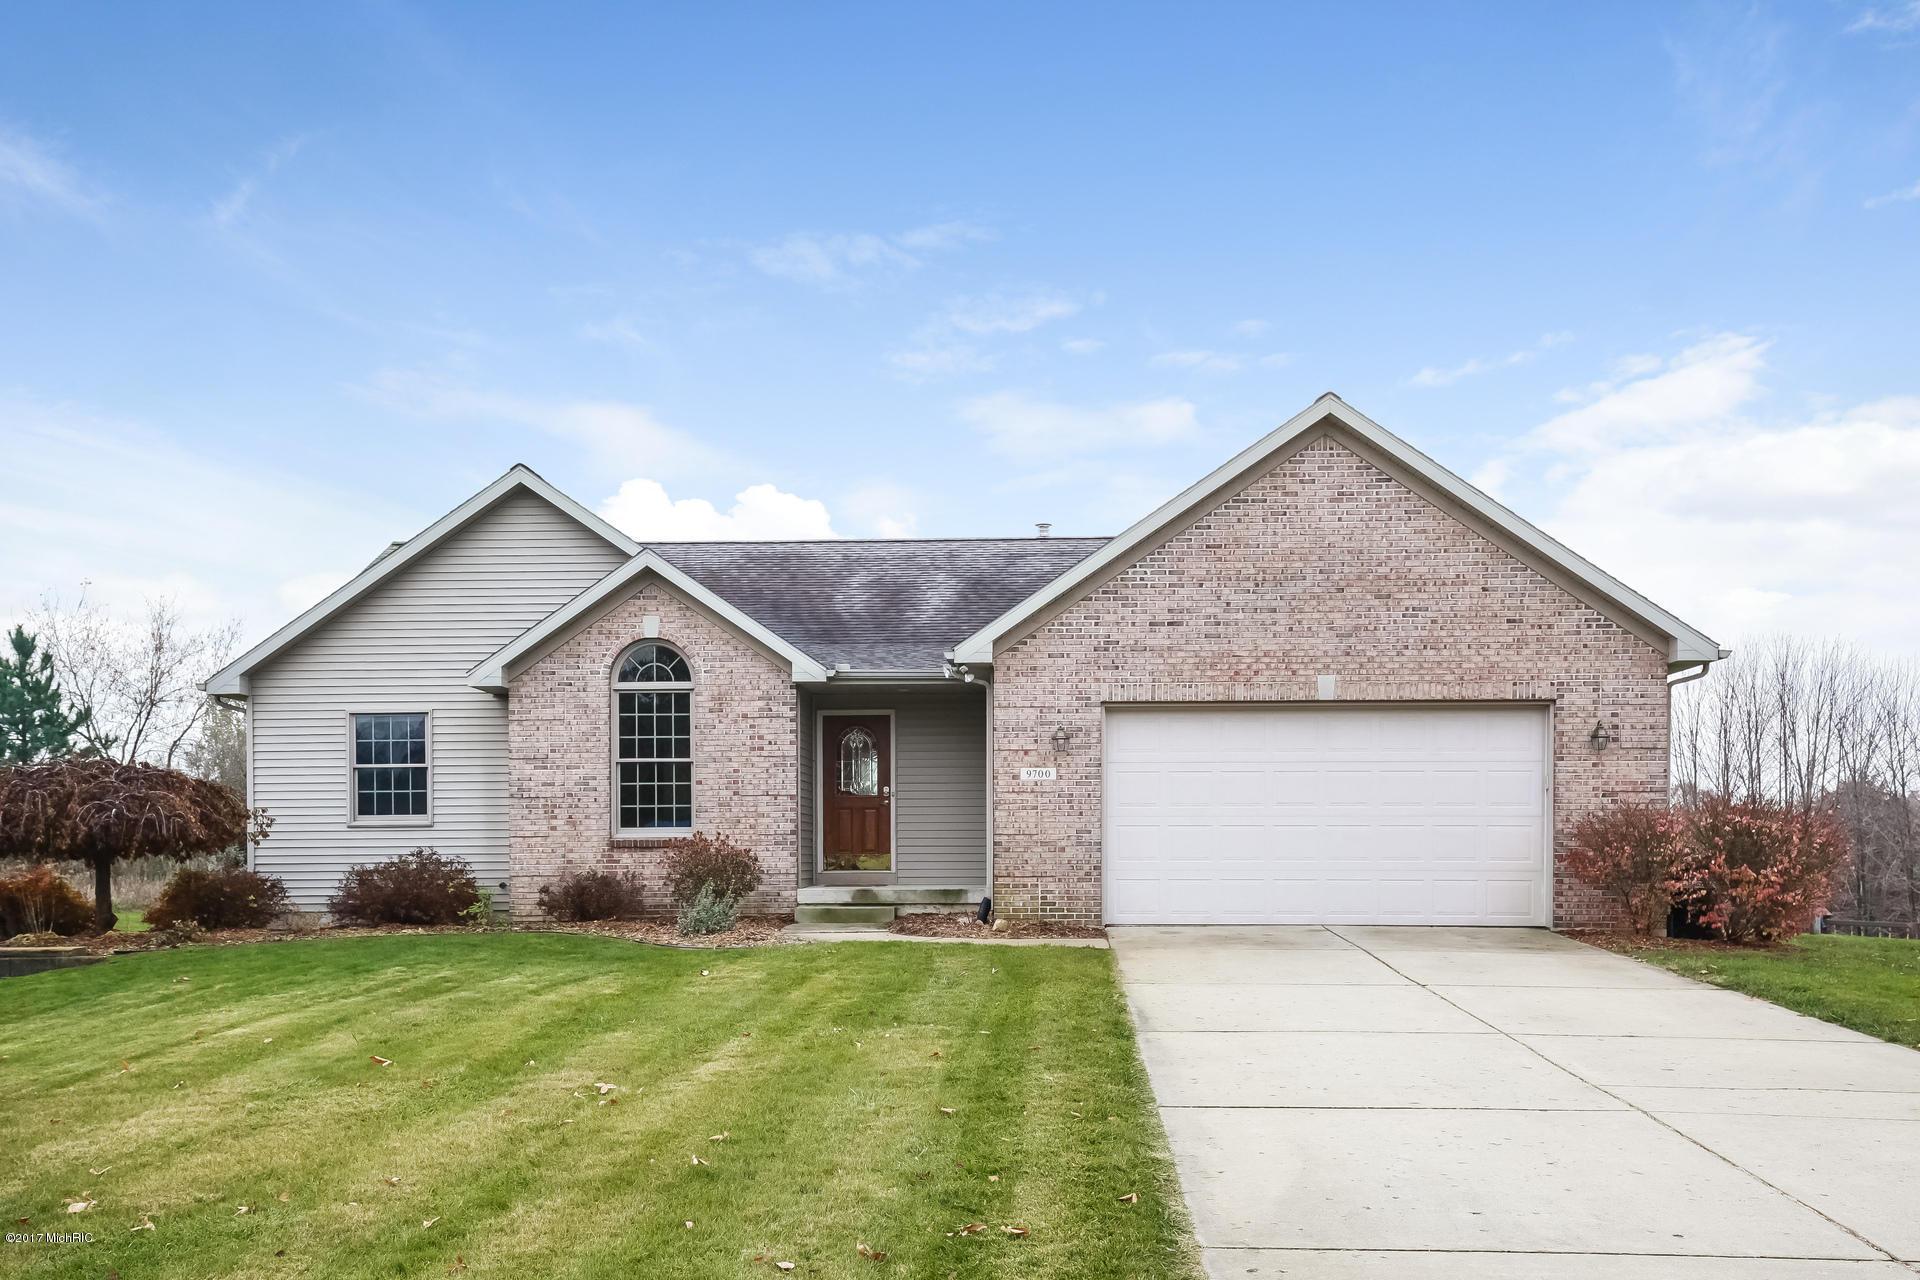 Single Family Home for Sale at 9700 Snow Ridge 9700 Snow Ridge Alto, Michigan 49302 United States